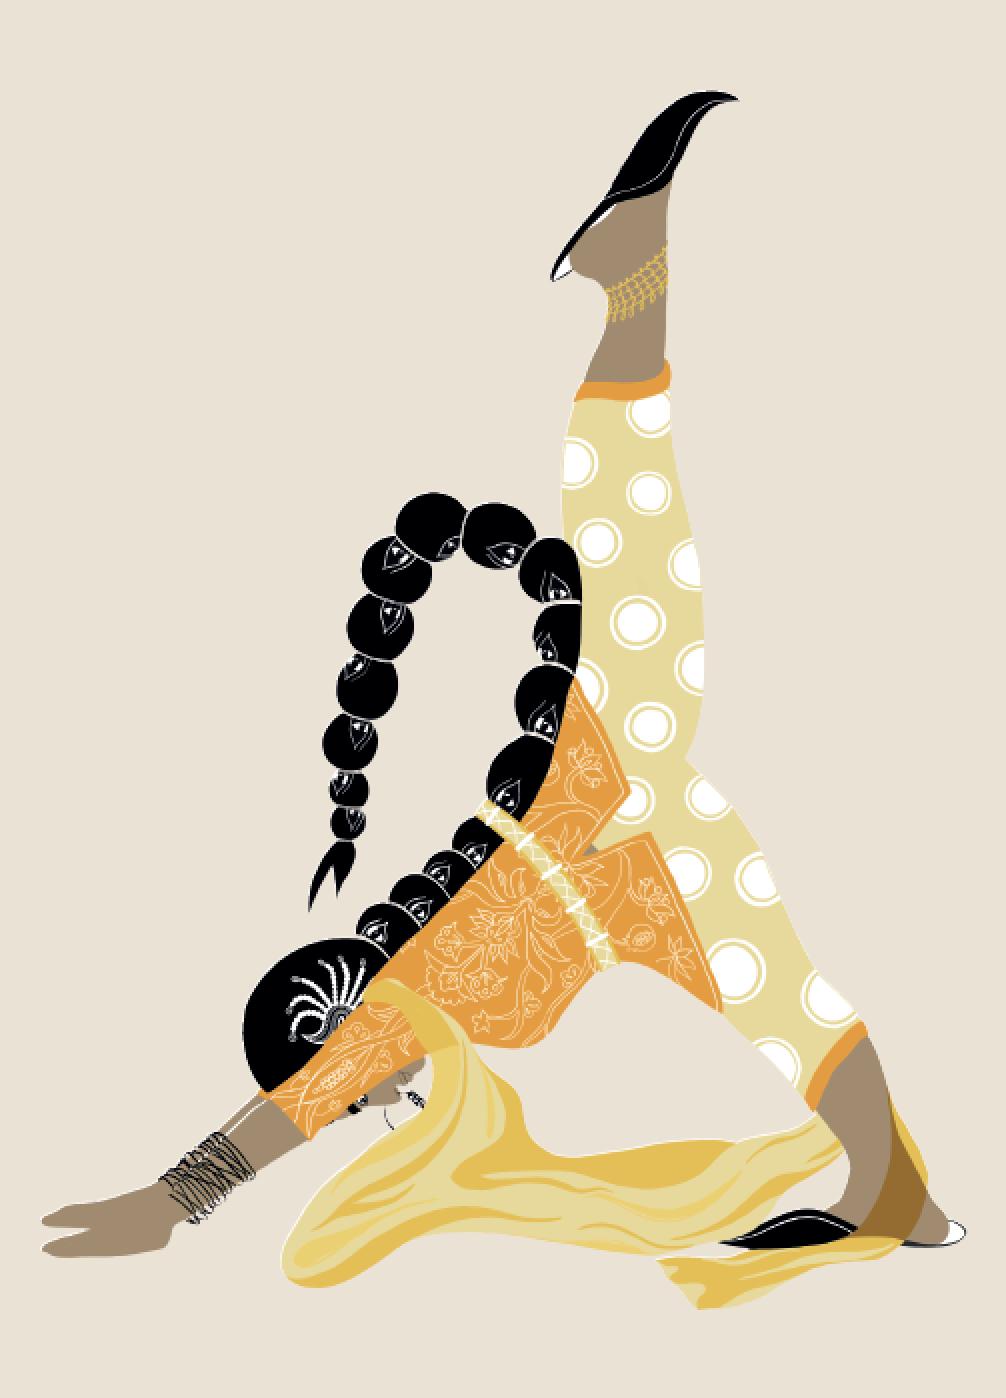 2019. Eka Pada Adho Svan ā sana (Mountain Pose) Digital print on paper 5 in. x 7 in.  Practiced wearing a high-cut kameez with fitted brocade salwar, jadai billai braid jewellery and juttis sharp as knives.   Purchase